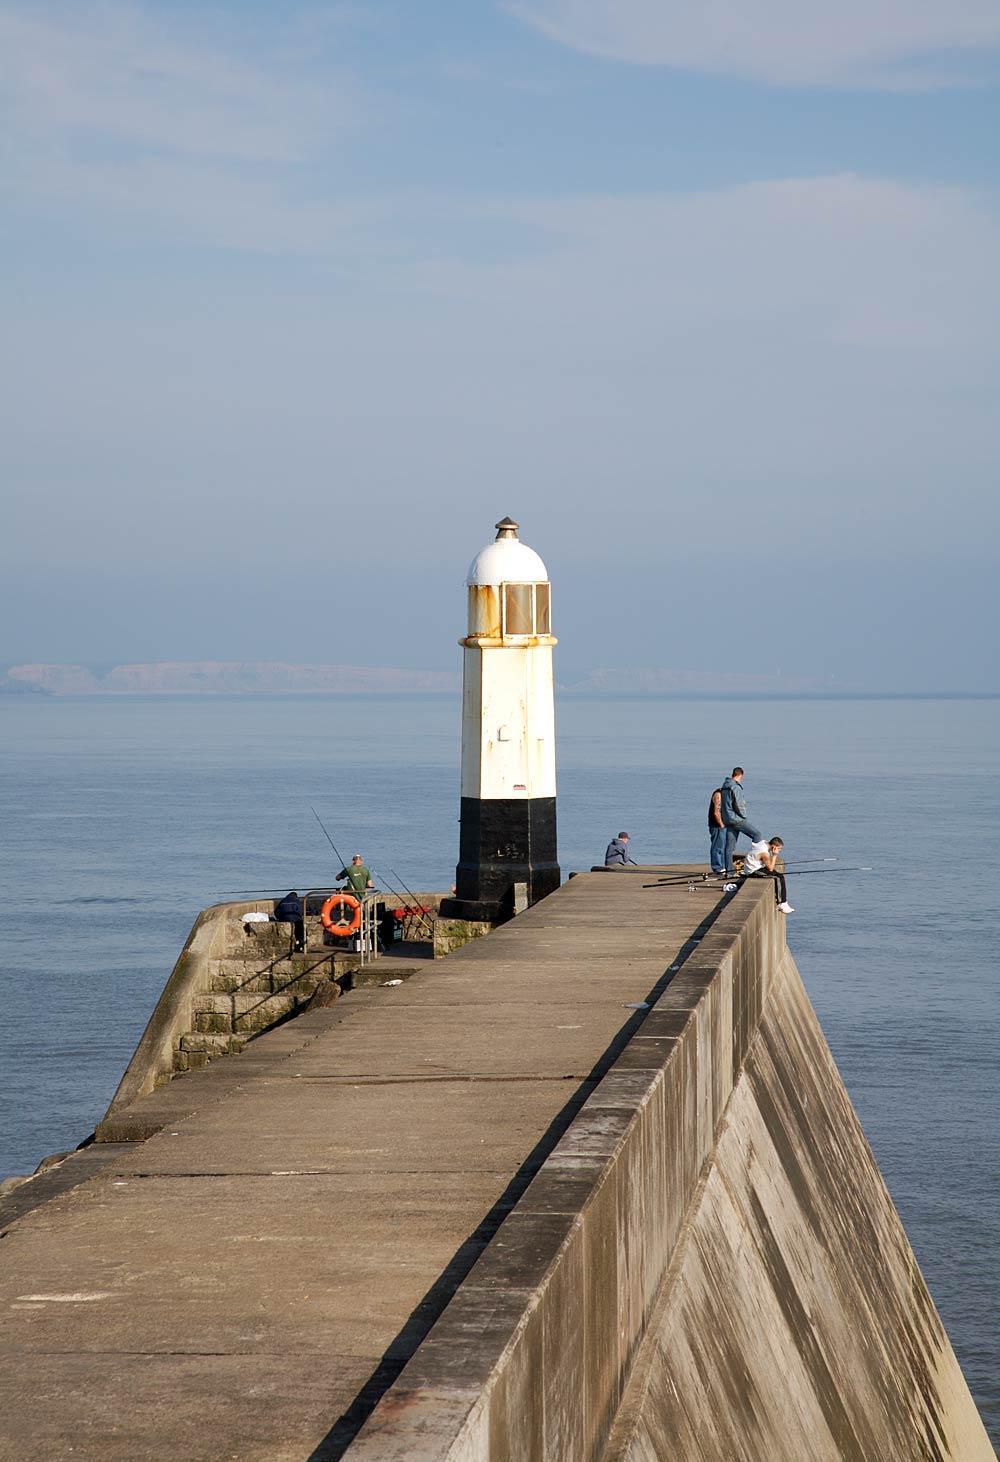 Porthcawl breakwater lighthouse